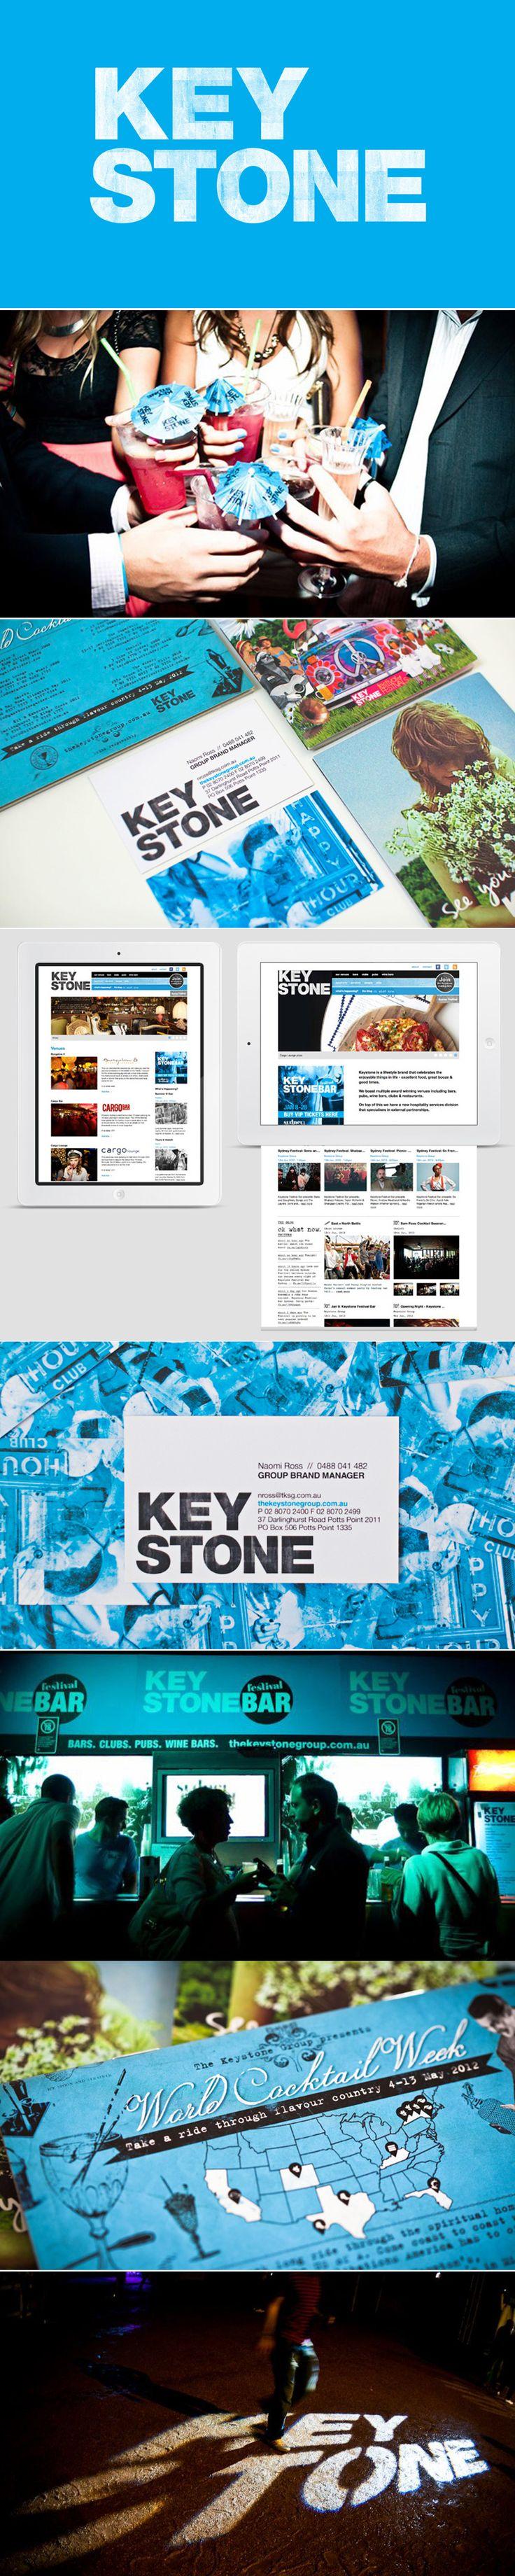 The Keystone Group Rebrand.  Keystone is a lifestyle brand that runs Sydney best hospitality venues.